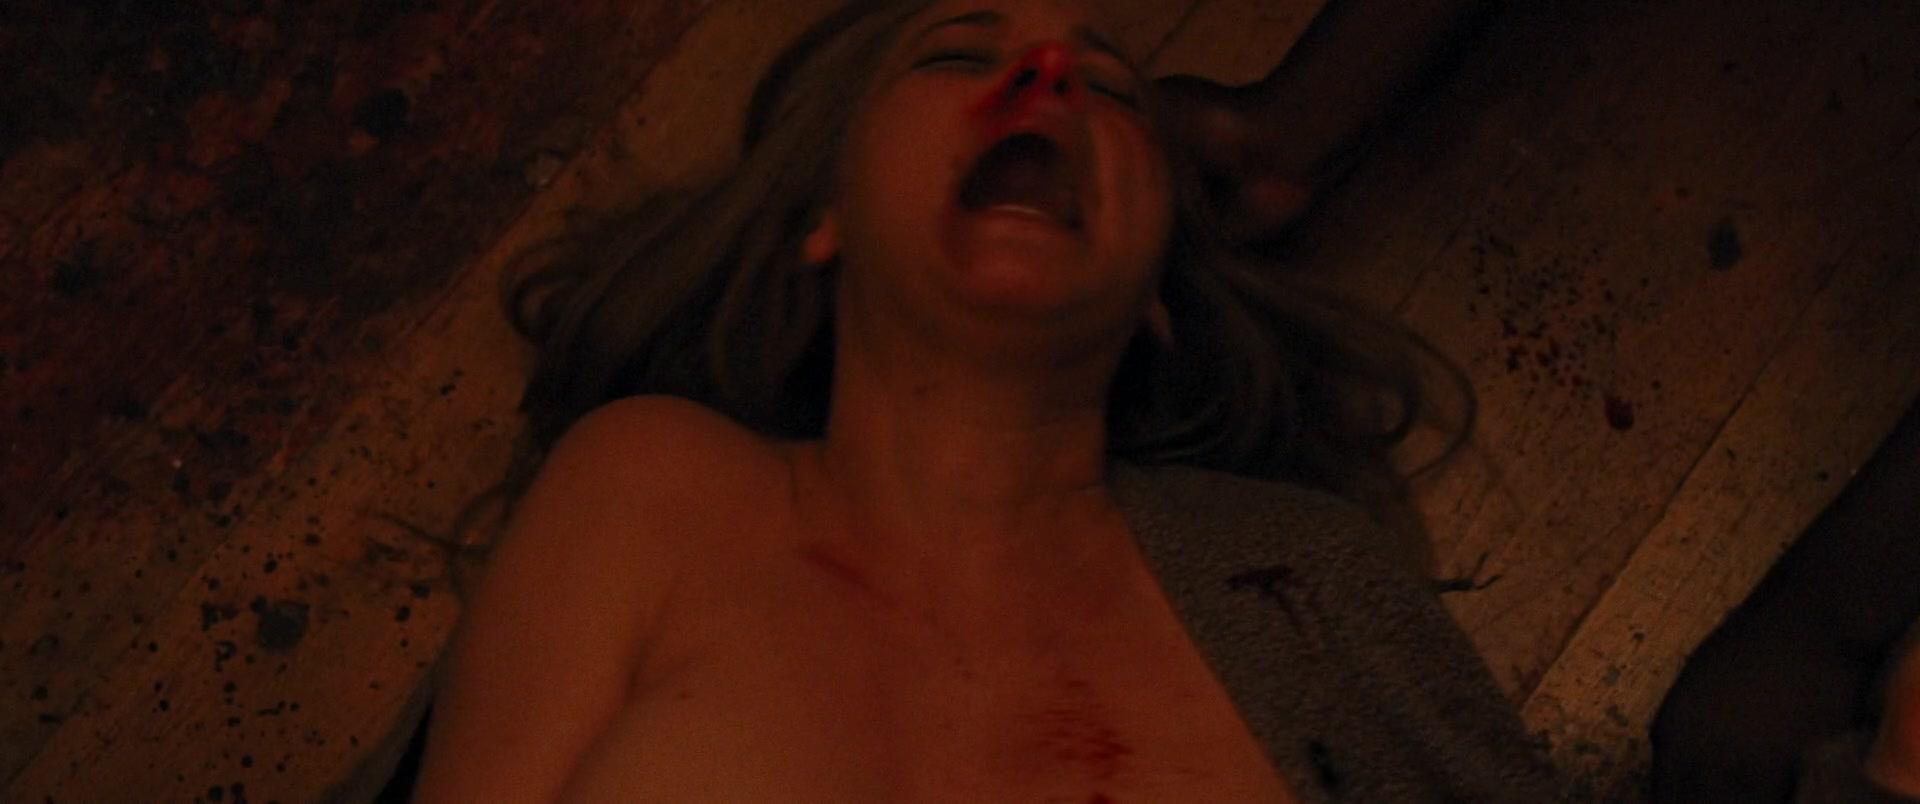 Jennifer-Lawrence-Michelle-Pfeiffer-Mother-40-thefappeningblog.com_.jpg